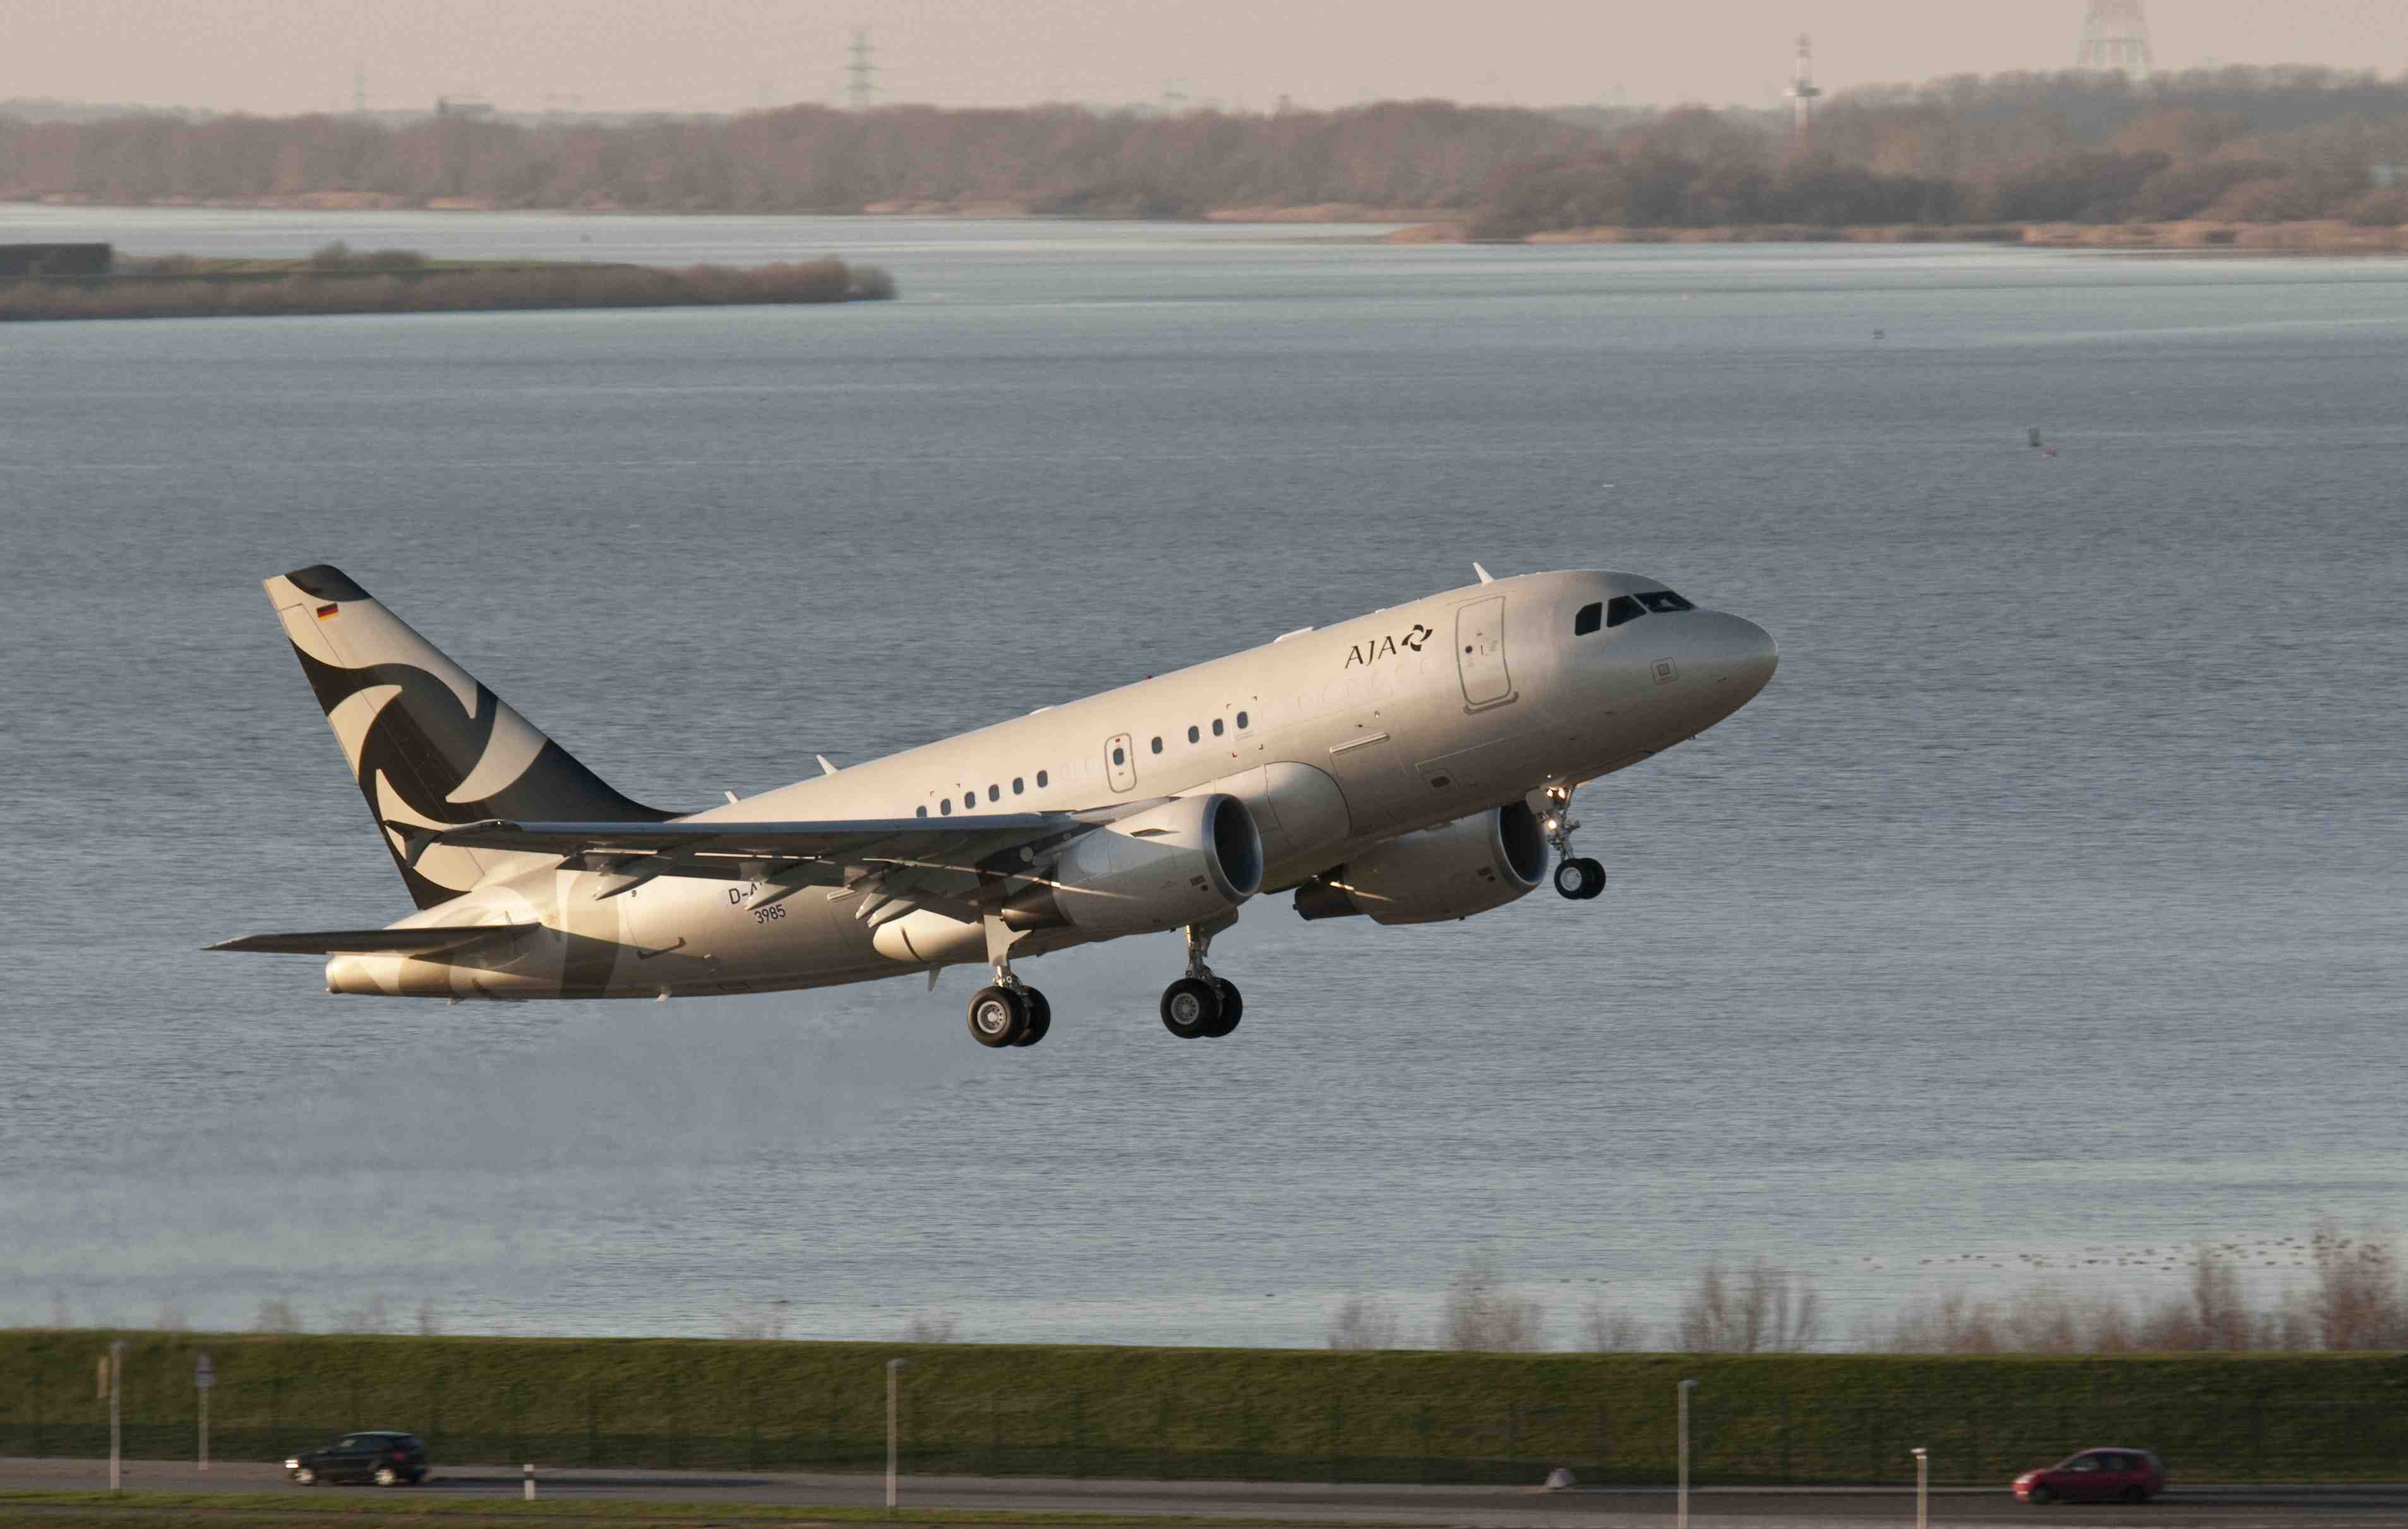 MEBA 2012: Business Jets Take Flight From Dubai's New Hub